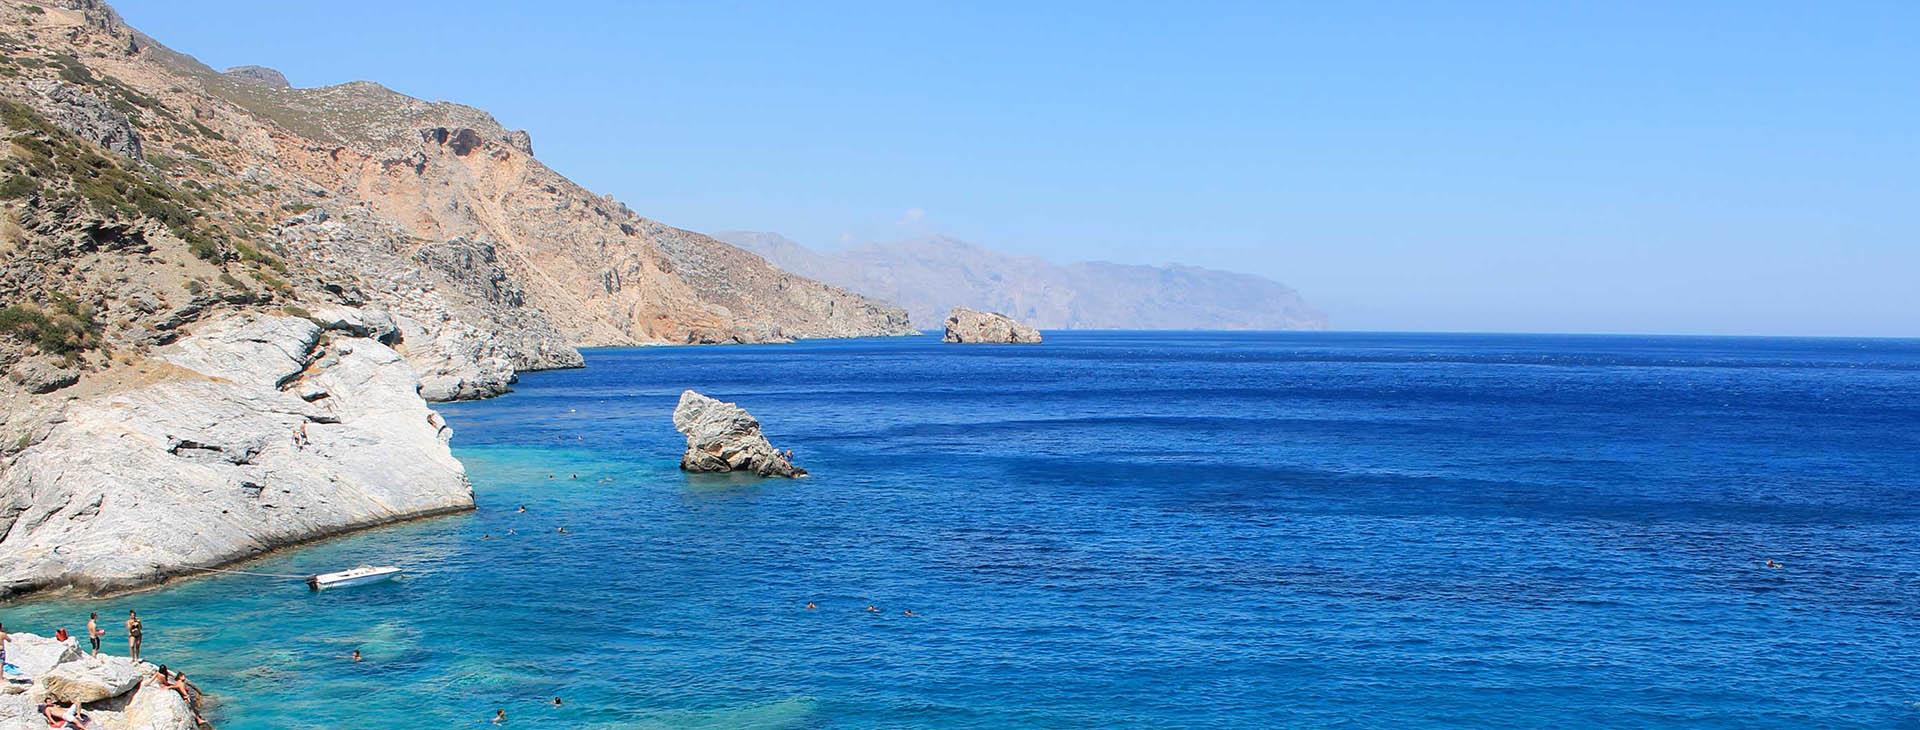 Agia Anna beach, Amorgos island